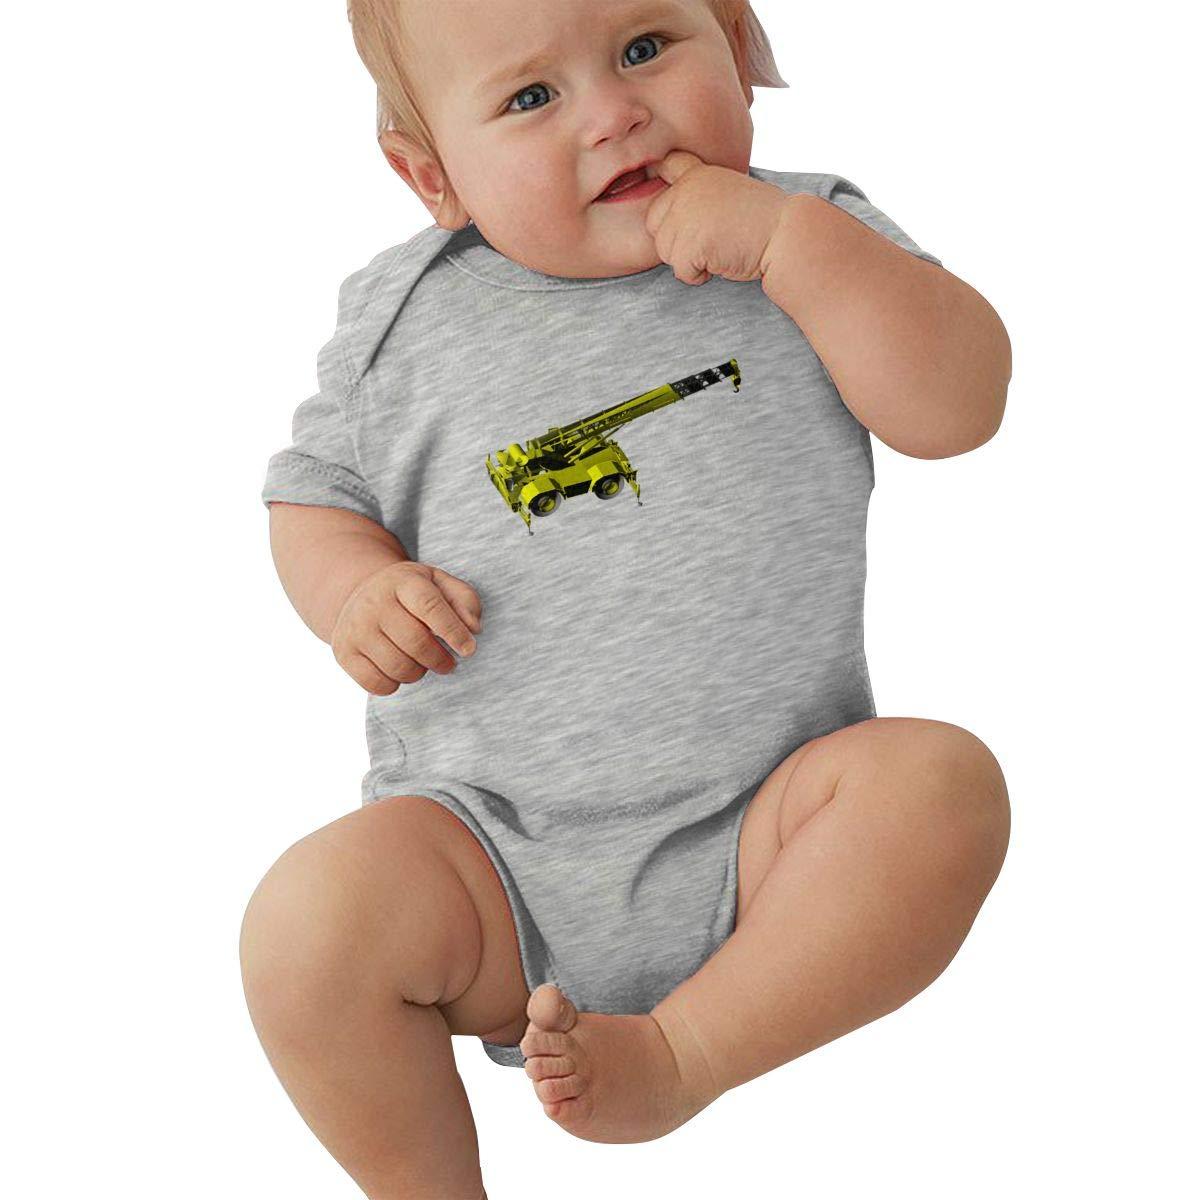 Cotton Baby Onesies-Unisex Breathable Rompers Forklift Model Bodysuits Lab Shoulder Neckline Jumpsuit Infant One-Piece Outfit Short Sleeve Jersey 0-24 Months